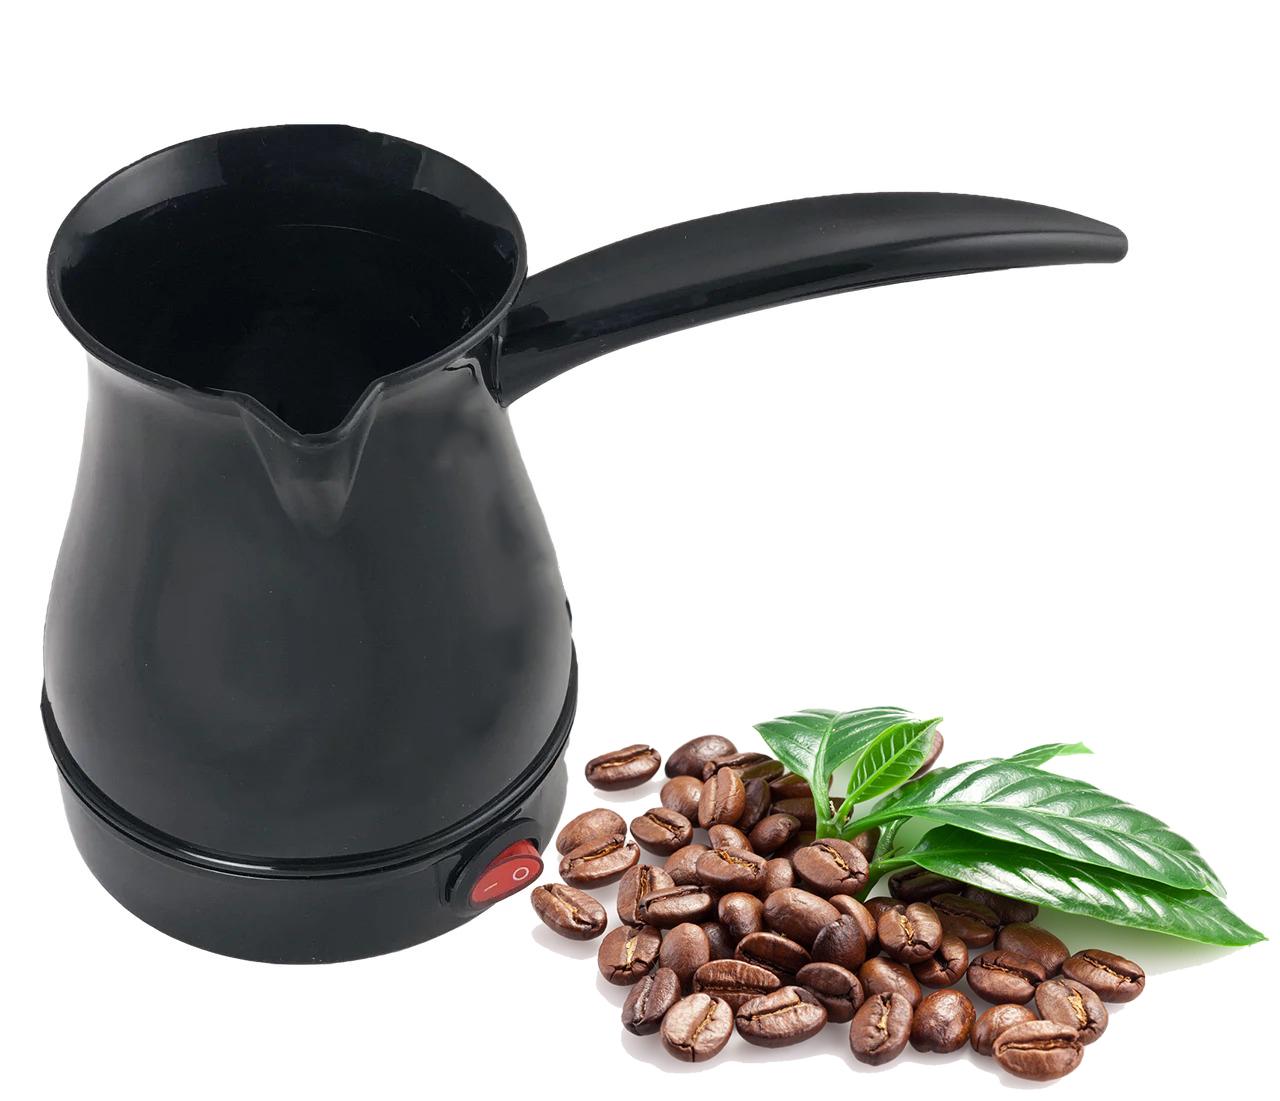 Електрична маленька кавоварка SIO SCM-2928 Black  Турка для кави